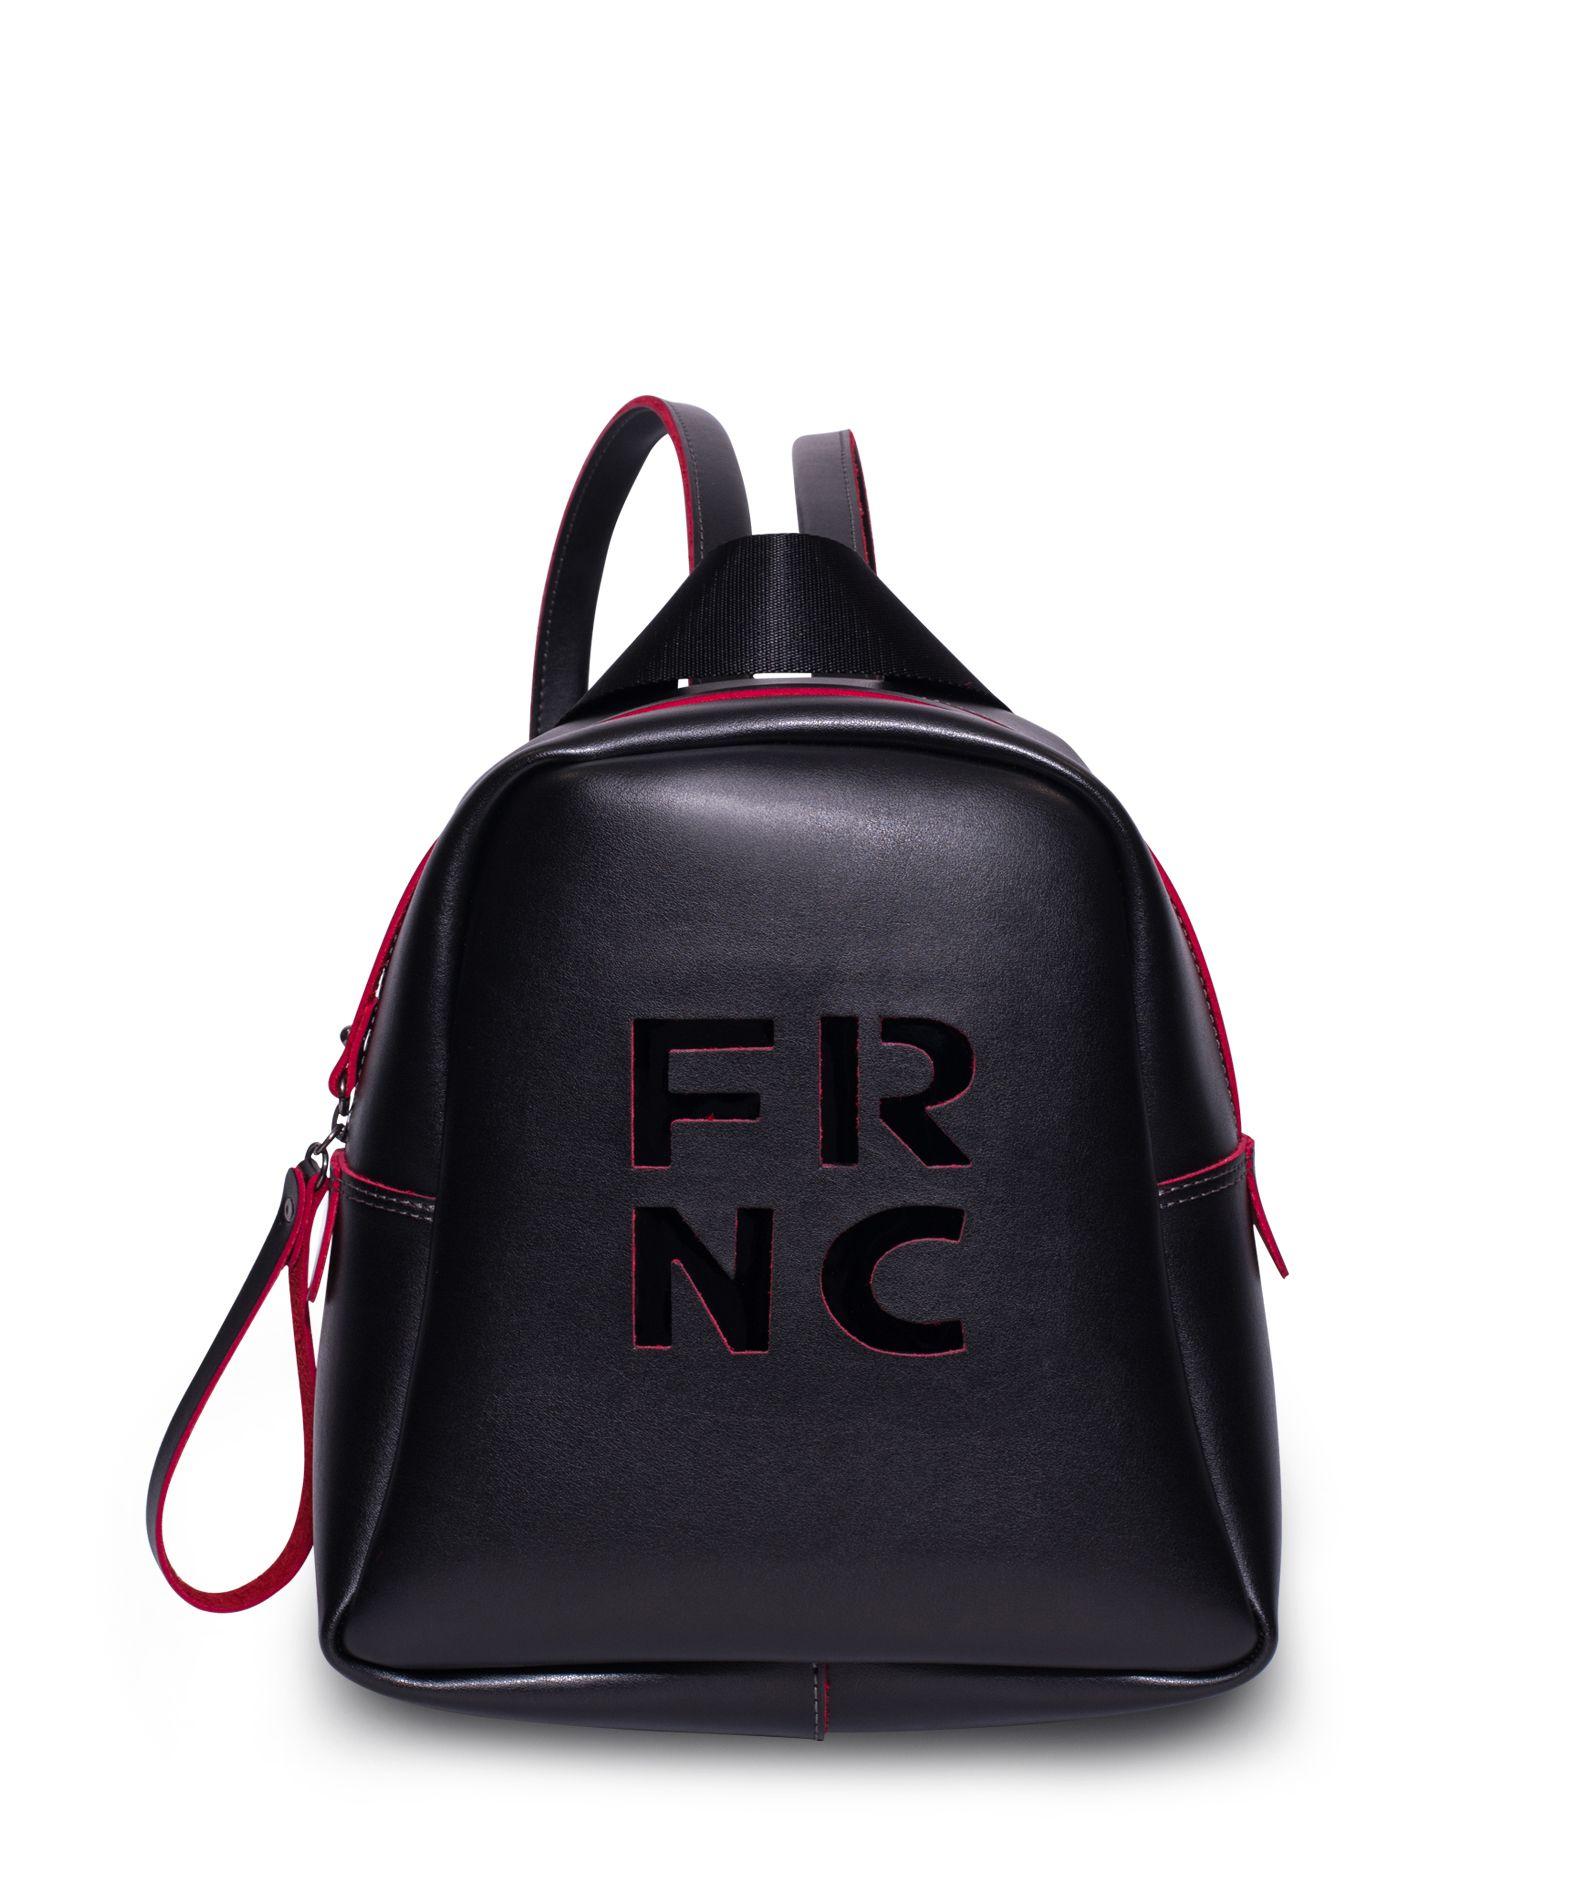 FRNC medium backpack 9 am - 9 pm purposes Bordeaux